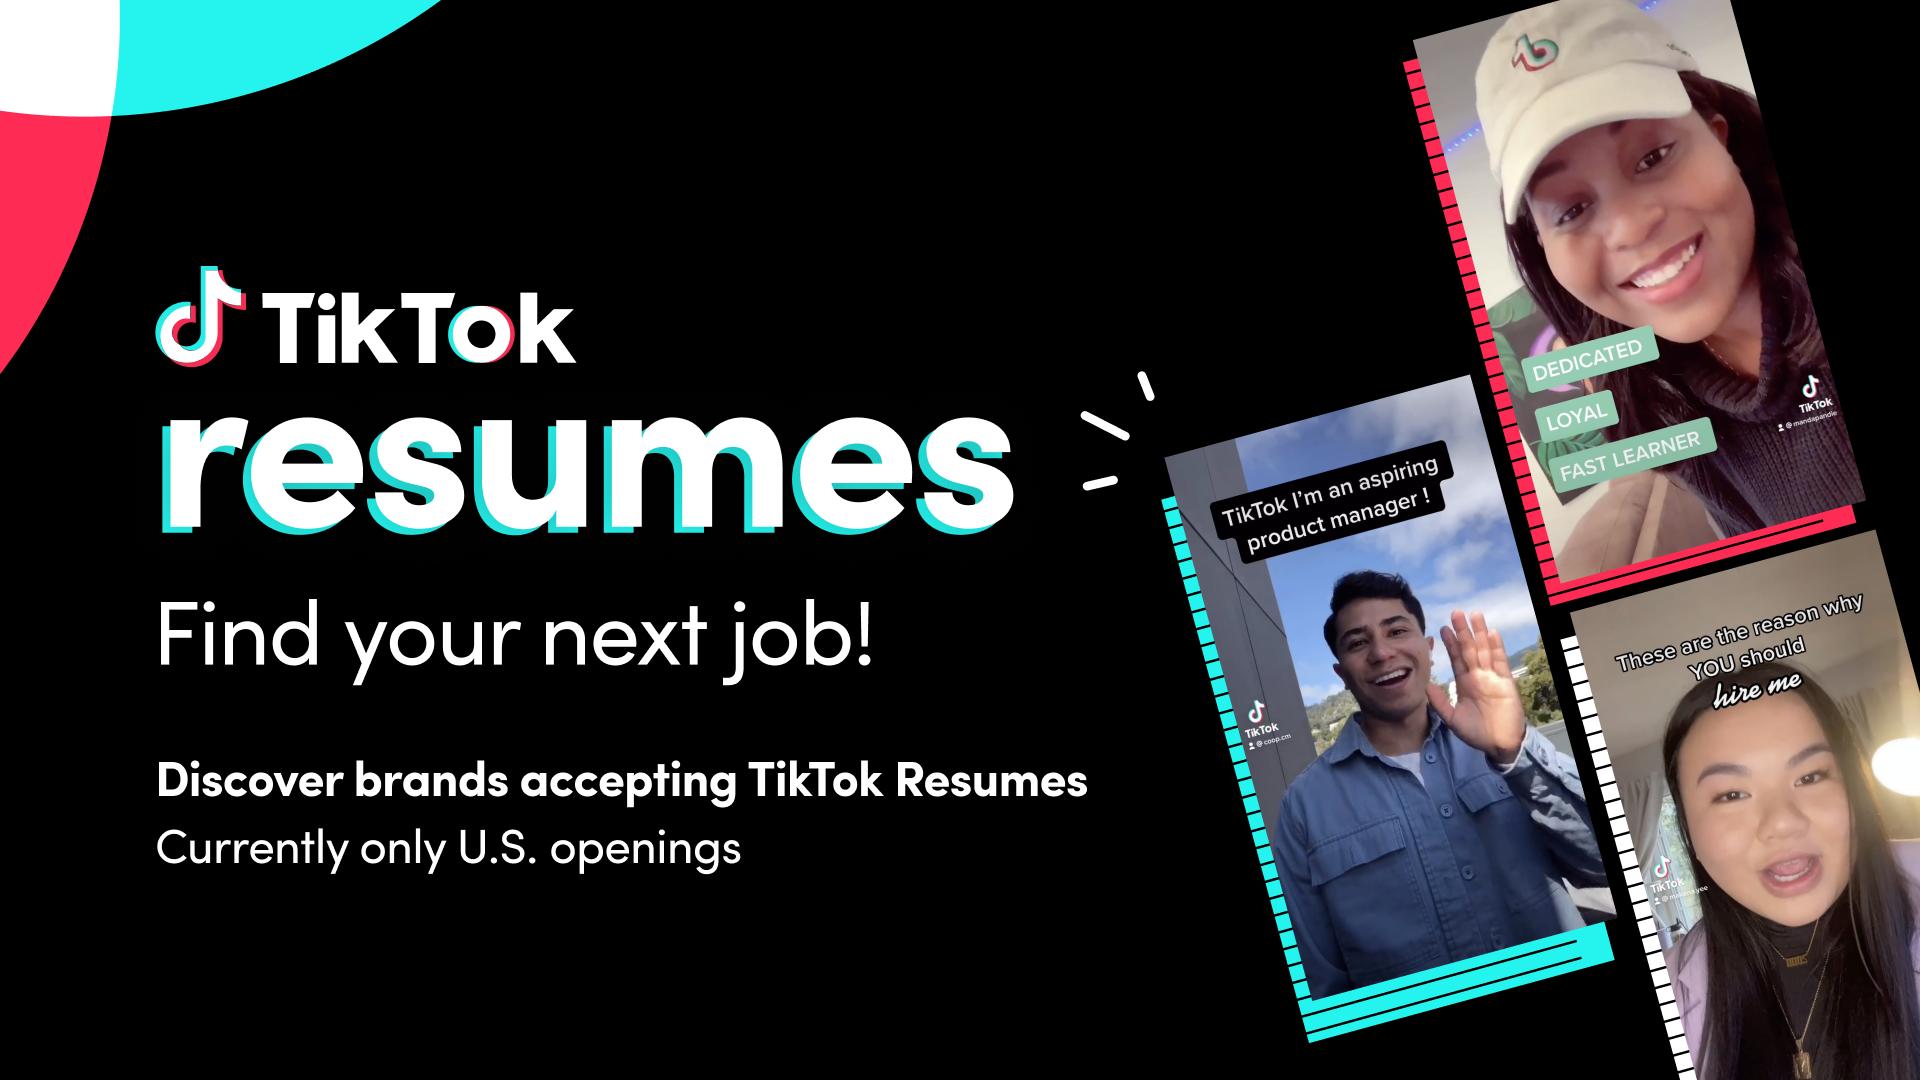 Find a job with TikTok Resumes   TikTok Newsroom